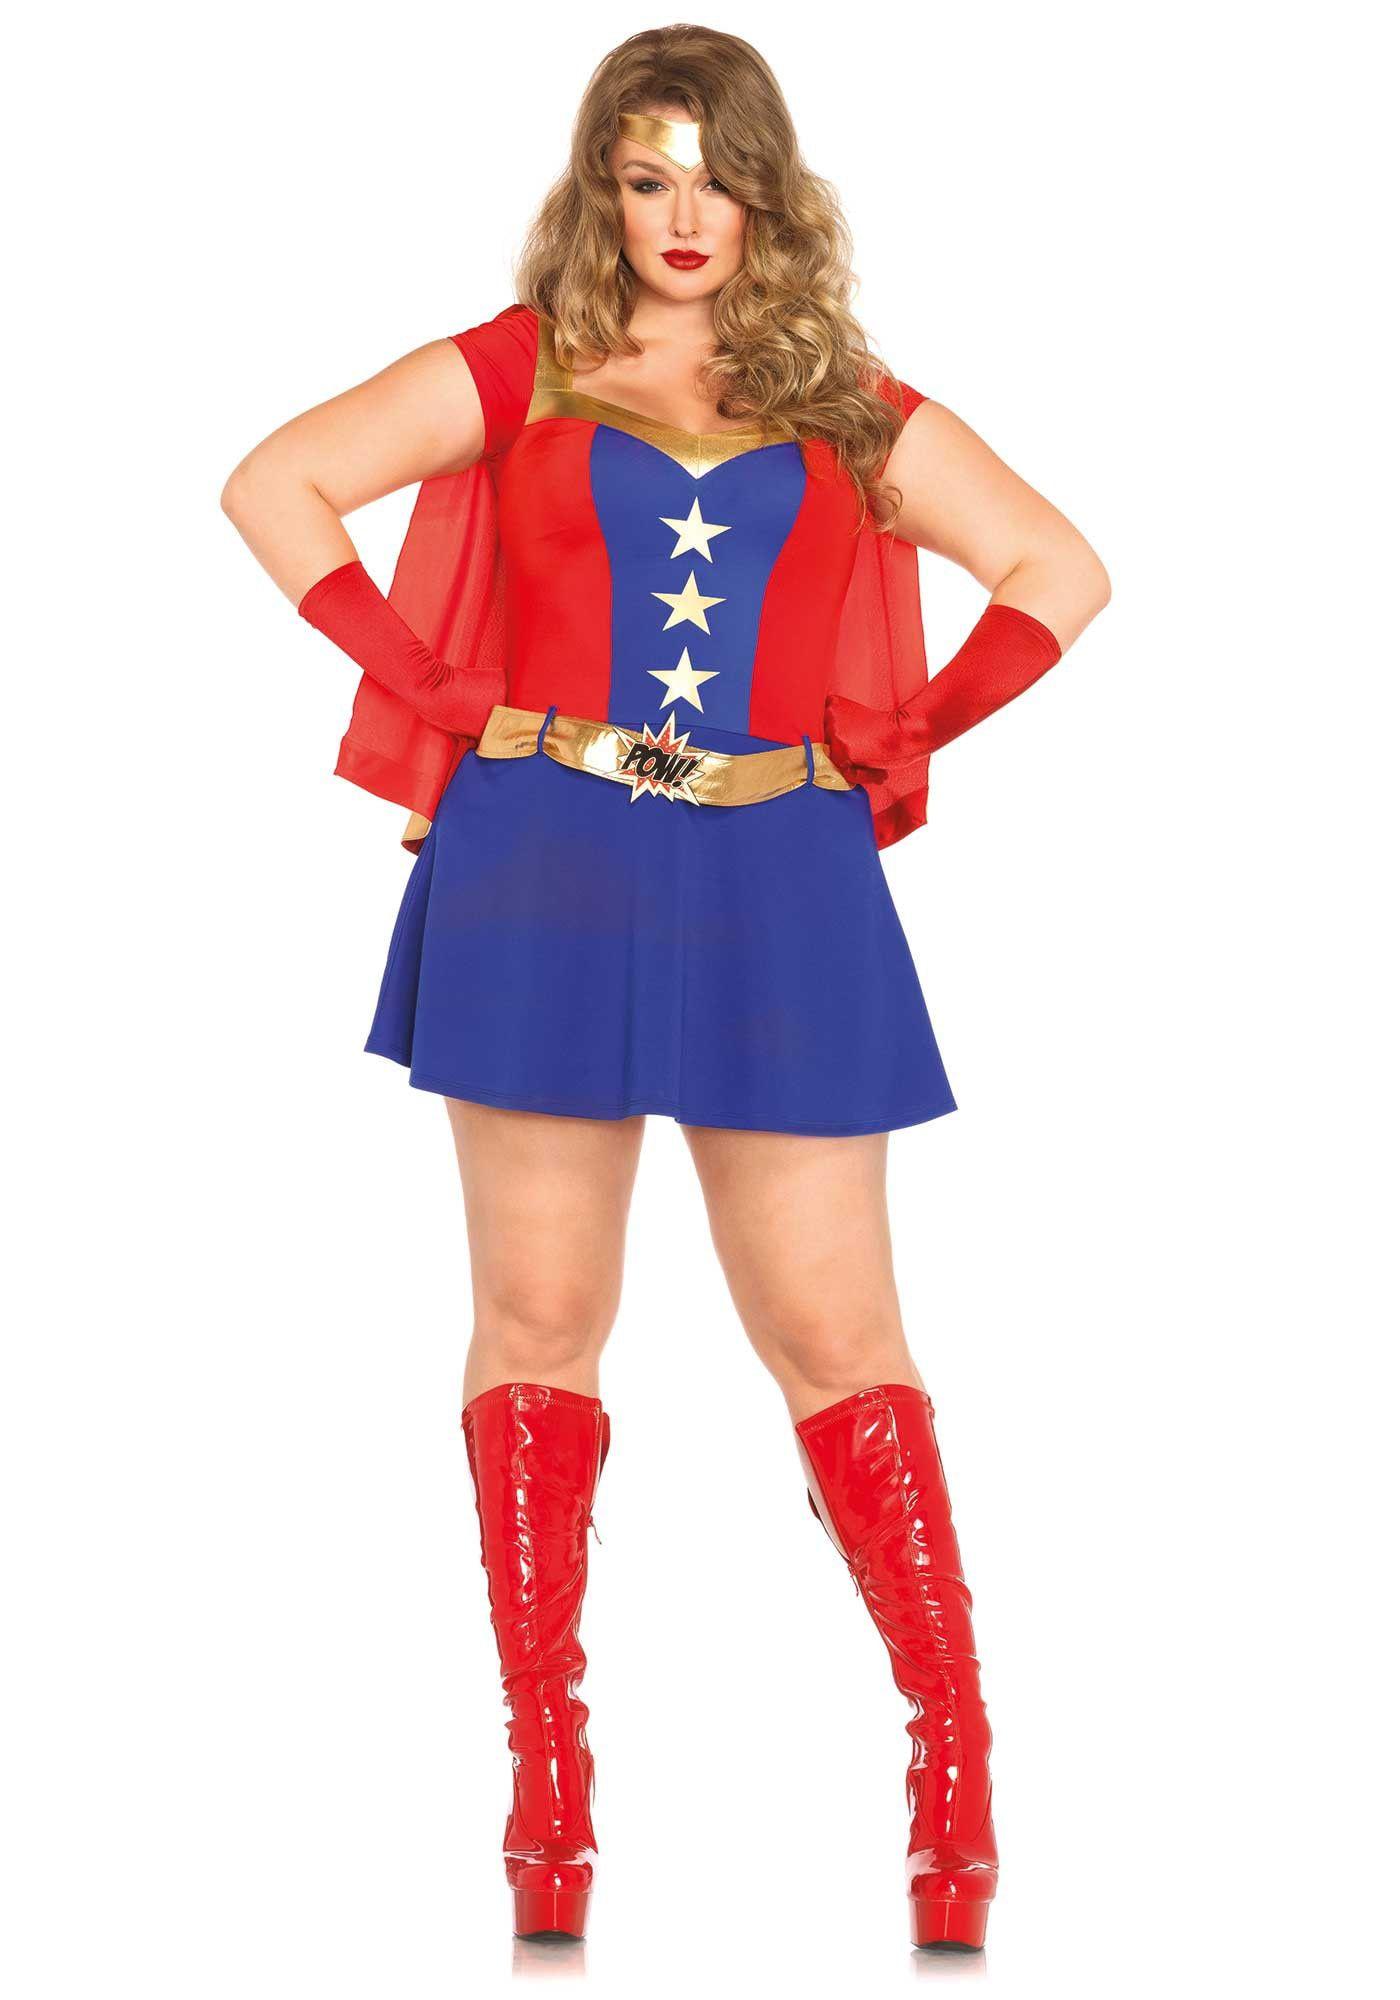 Vrouwelijke Spannende Superheldin (Plus Size) Kostuum